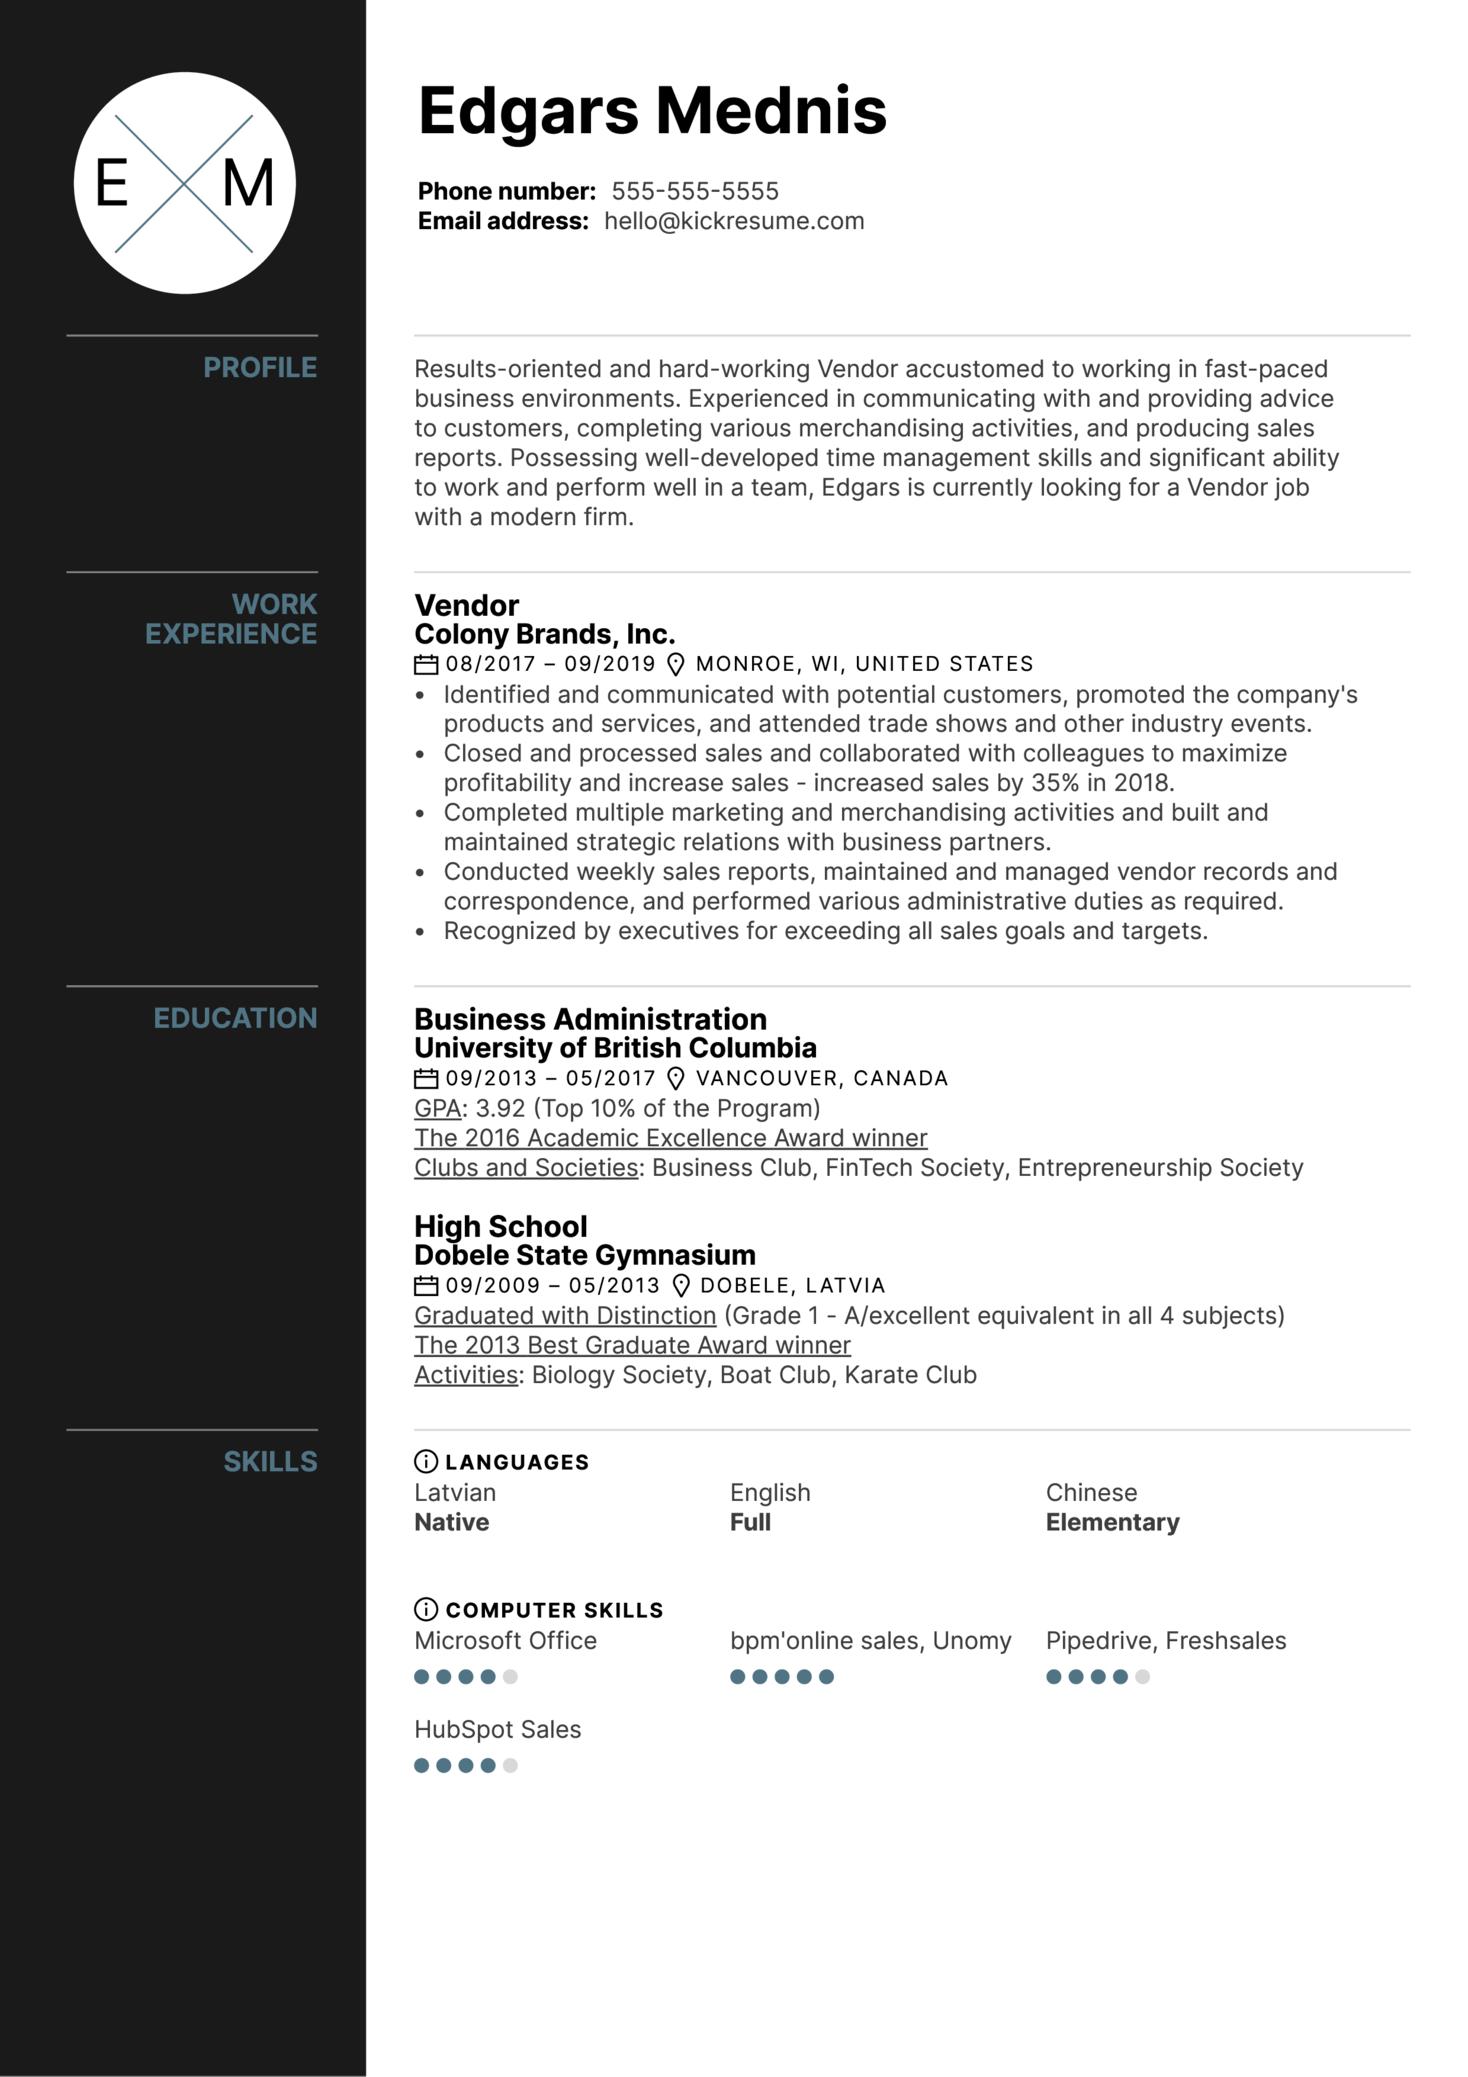 Vendor Resume Example (Teil 1)